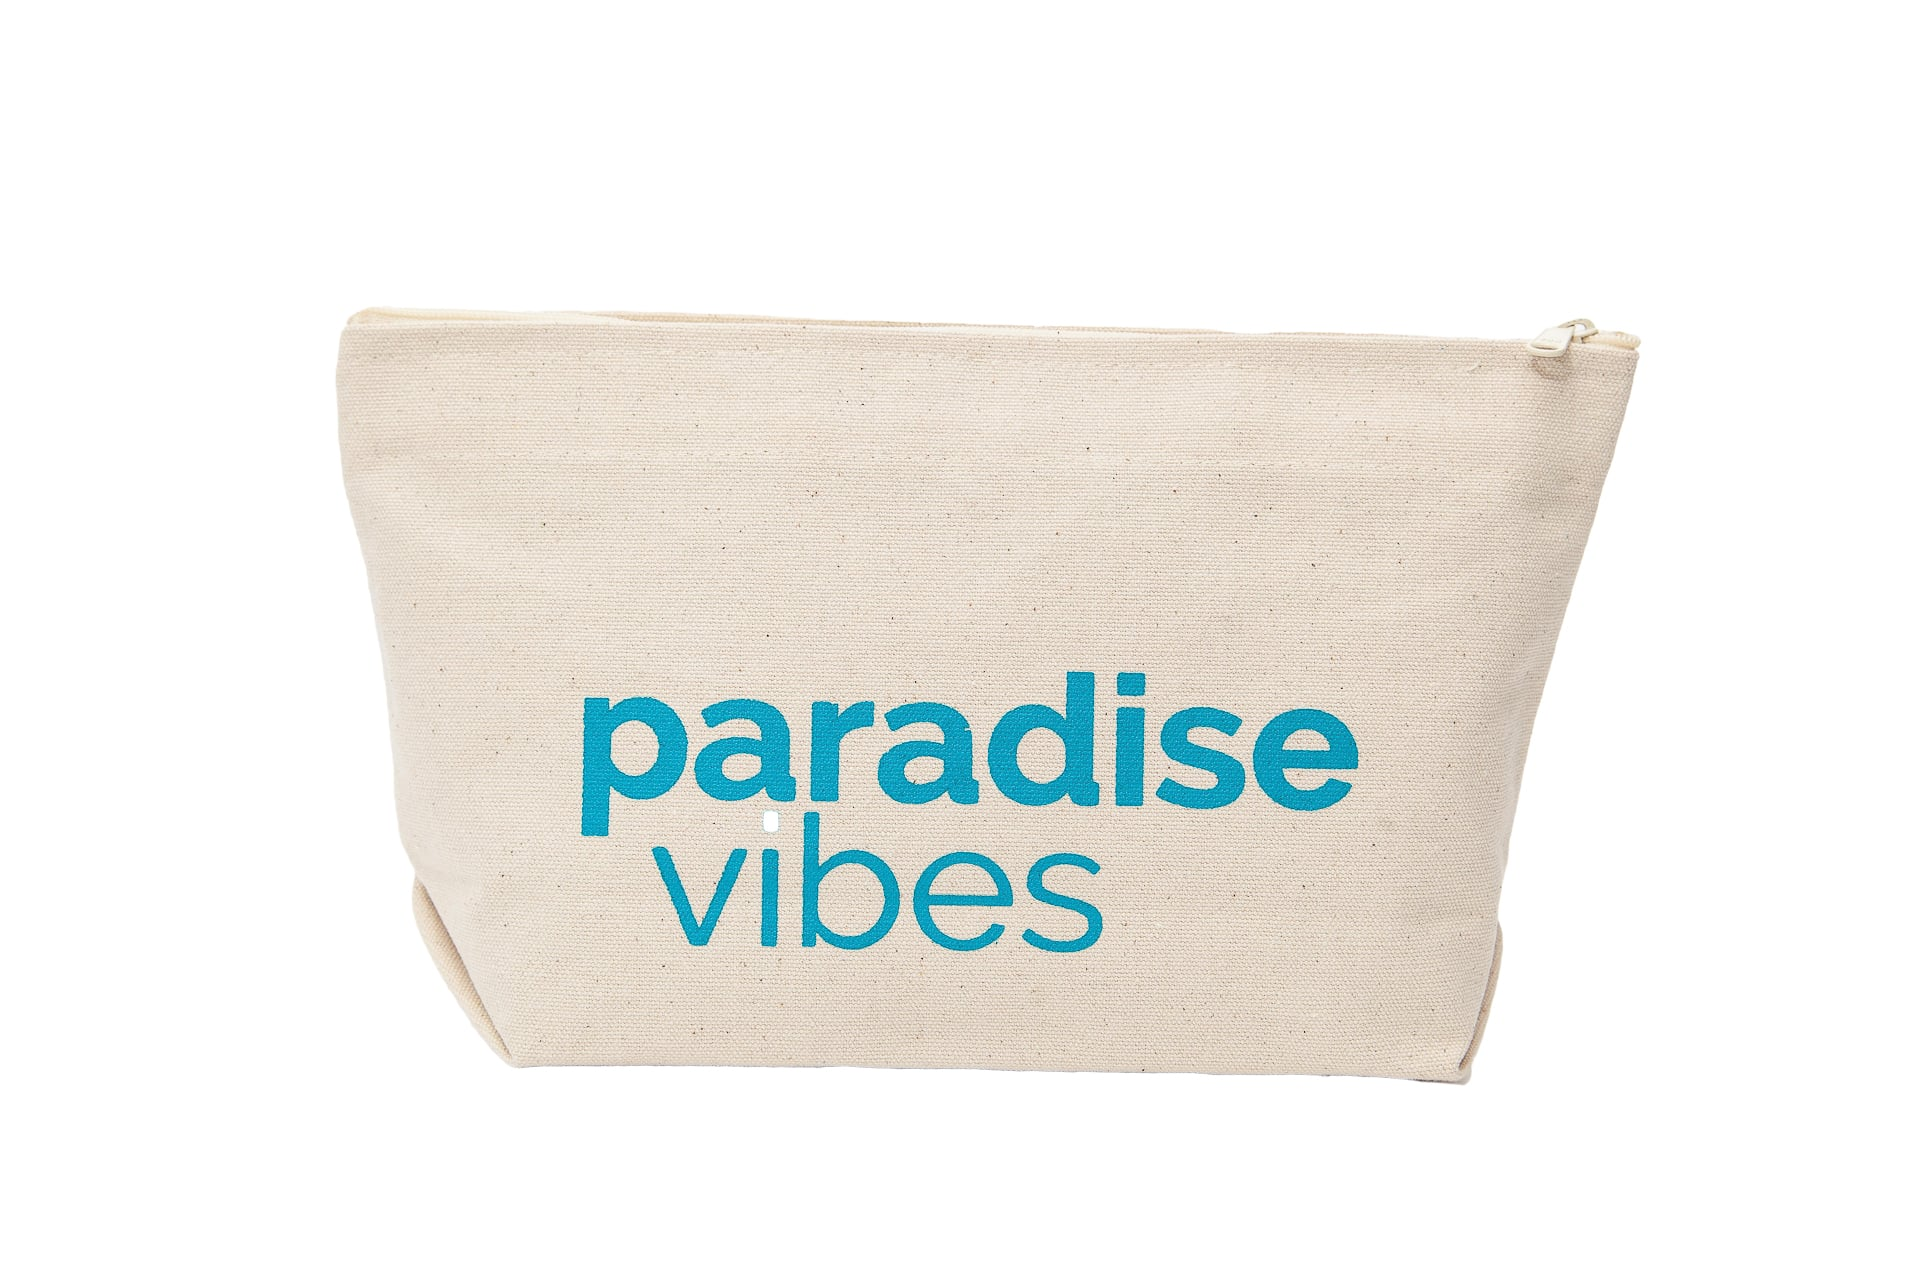 Paradise_vibes_front-letterpouch